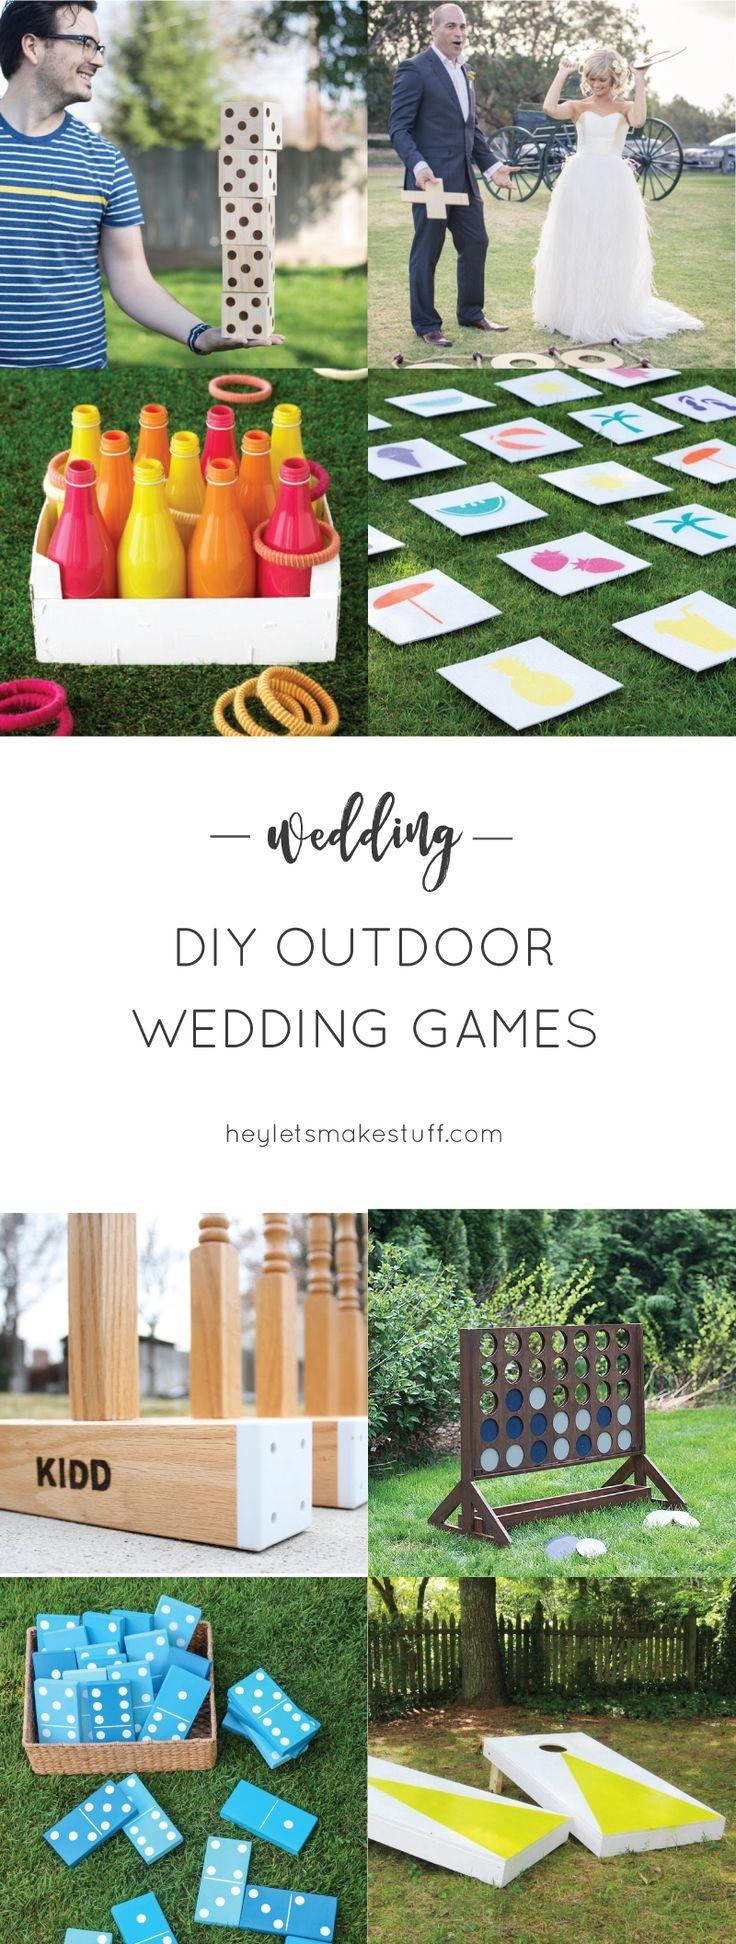 Diy Outdoor Wedding Games Wedding Games For Guests Lawn Games